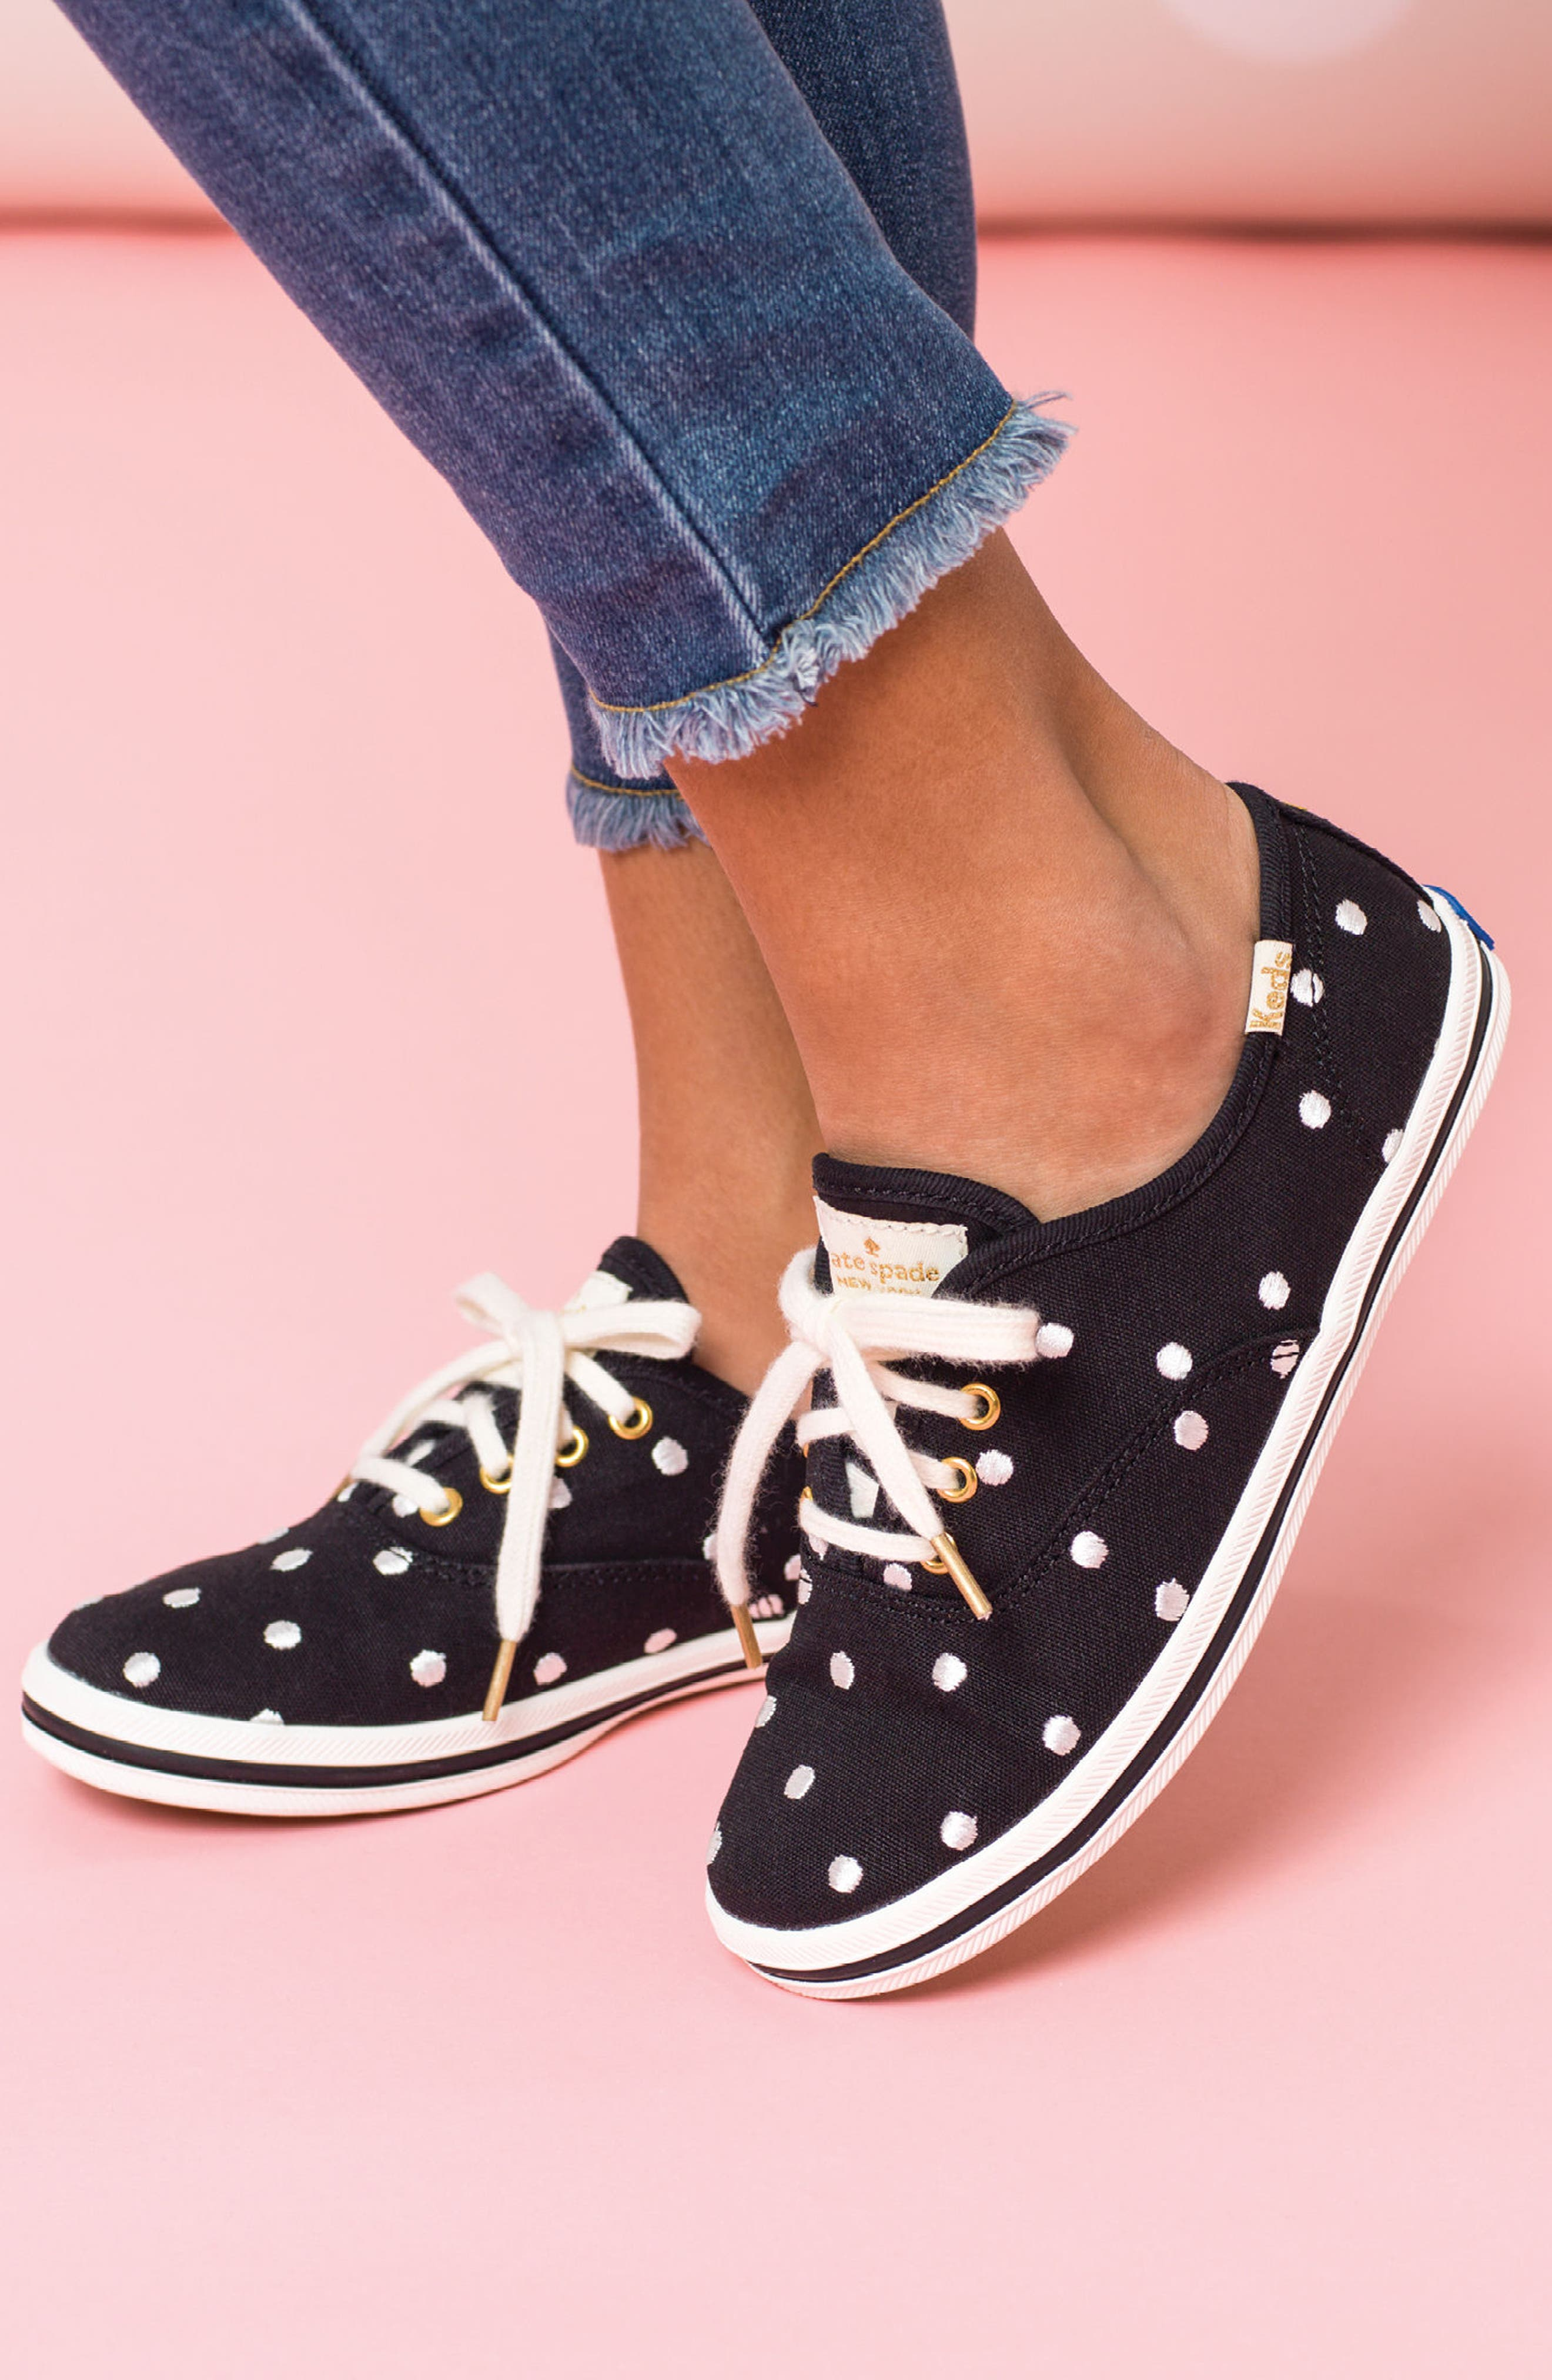 x kate spade new york champion polka dot lace-up shoe,                             Alternate thumbnail 8, color,                             BLACK DANCING DOT